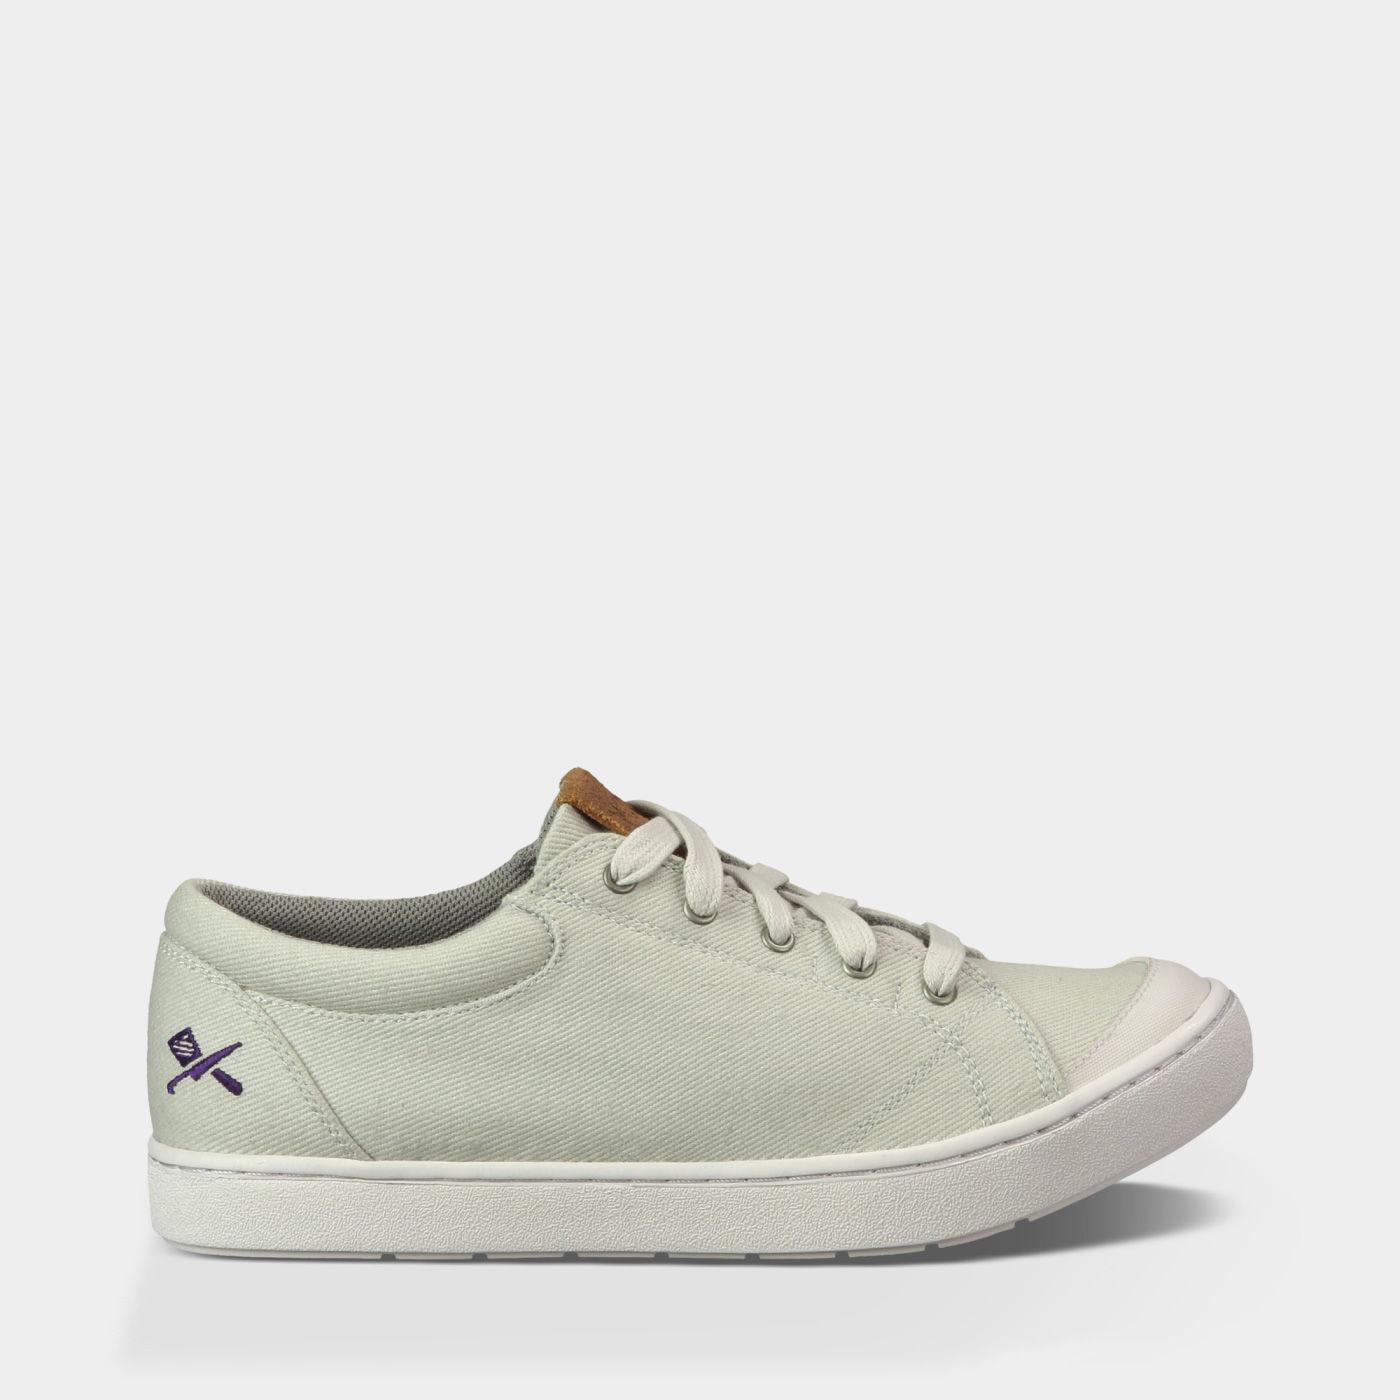 mozo 3738 lurk 9 s maven canvas shoes slip